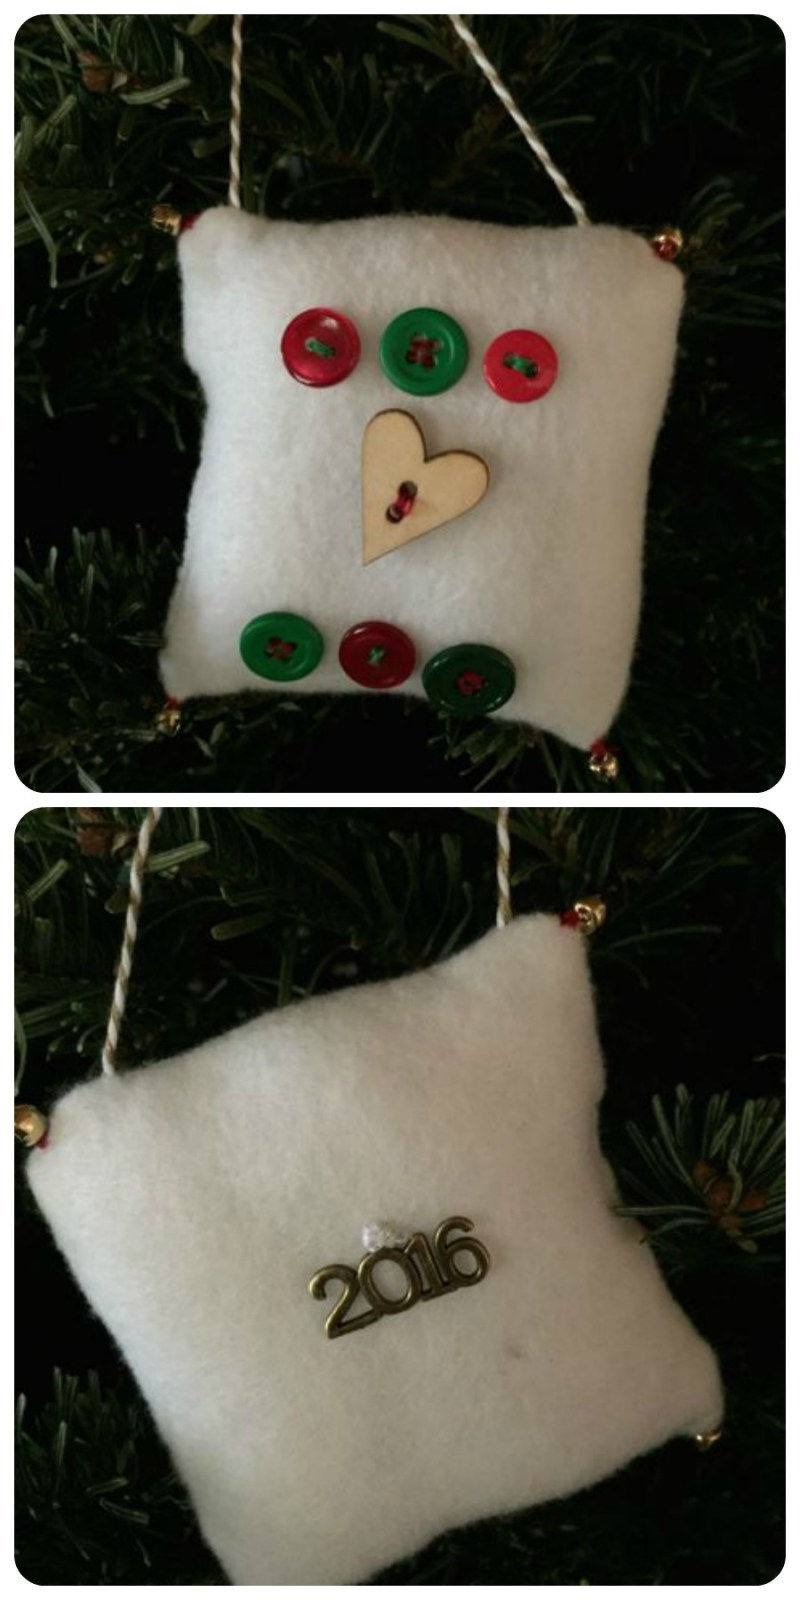 2016 family homemade ornament